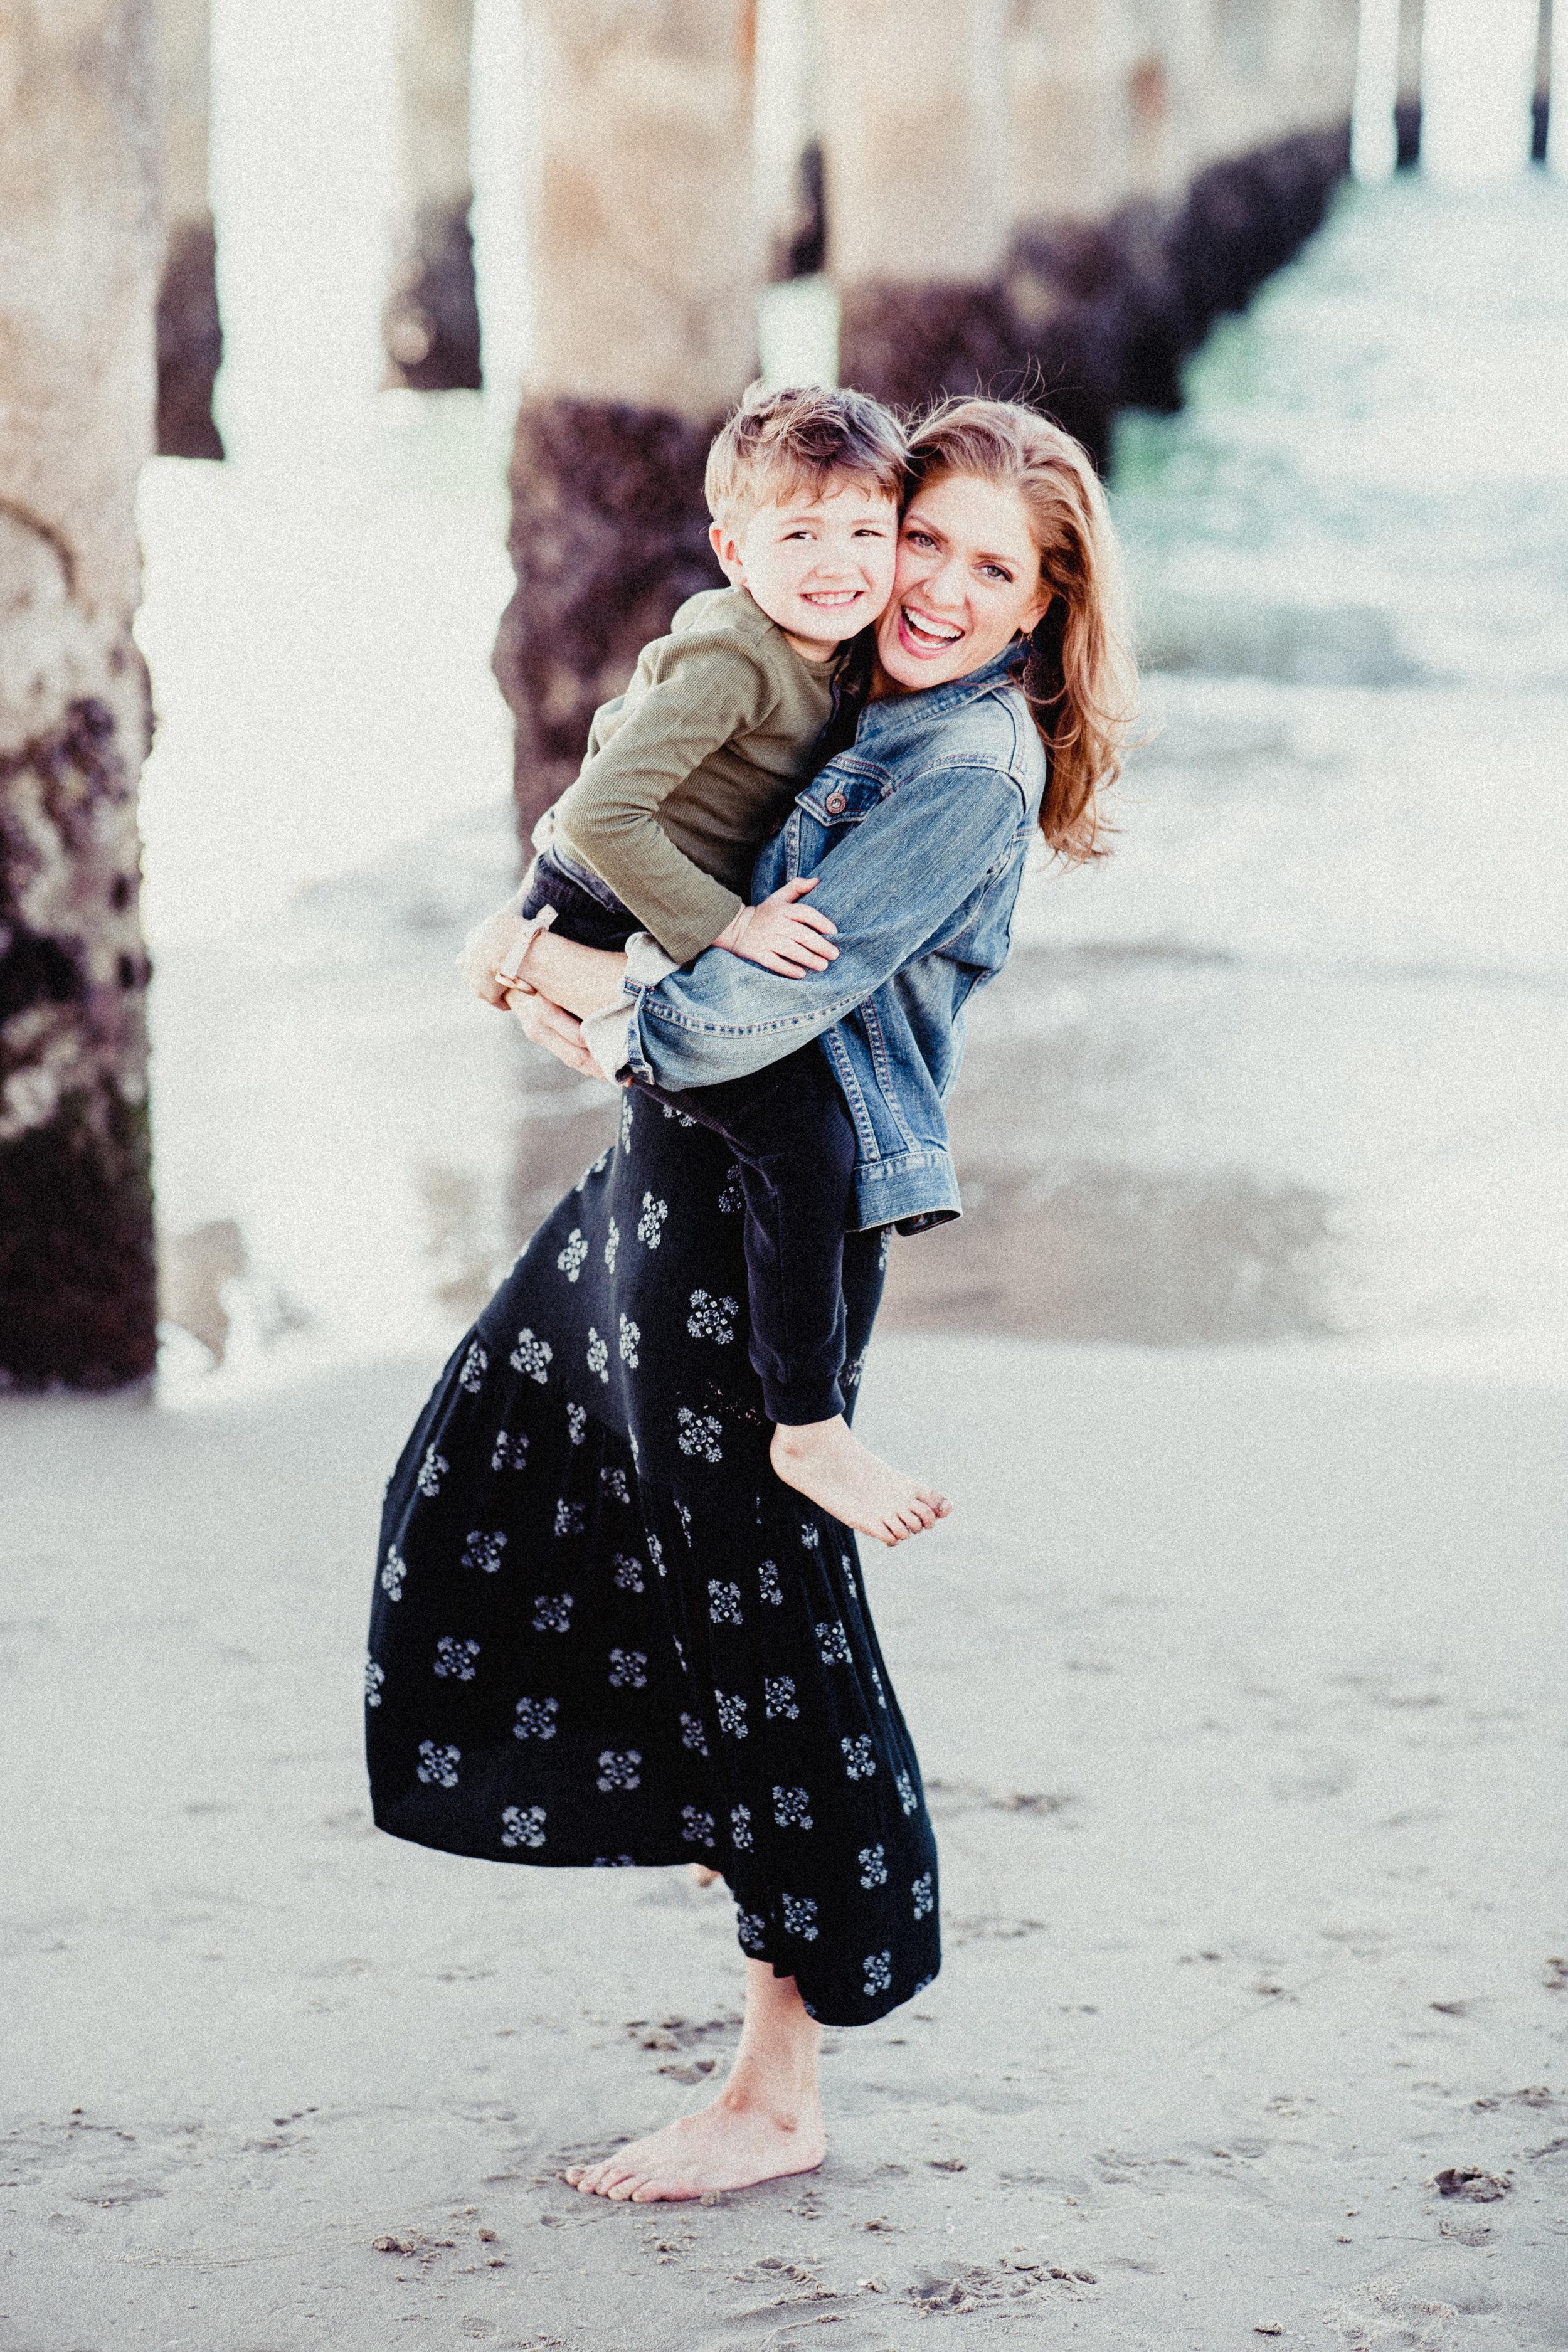 la manhatten beach photo shooting family portraits16.jpeg